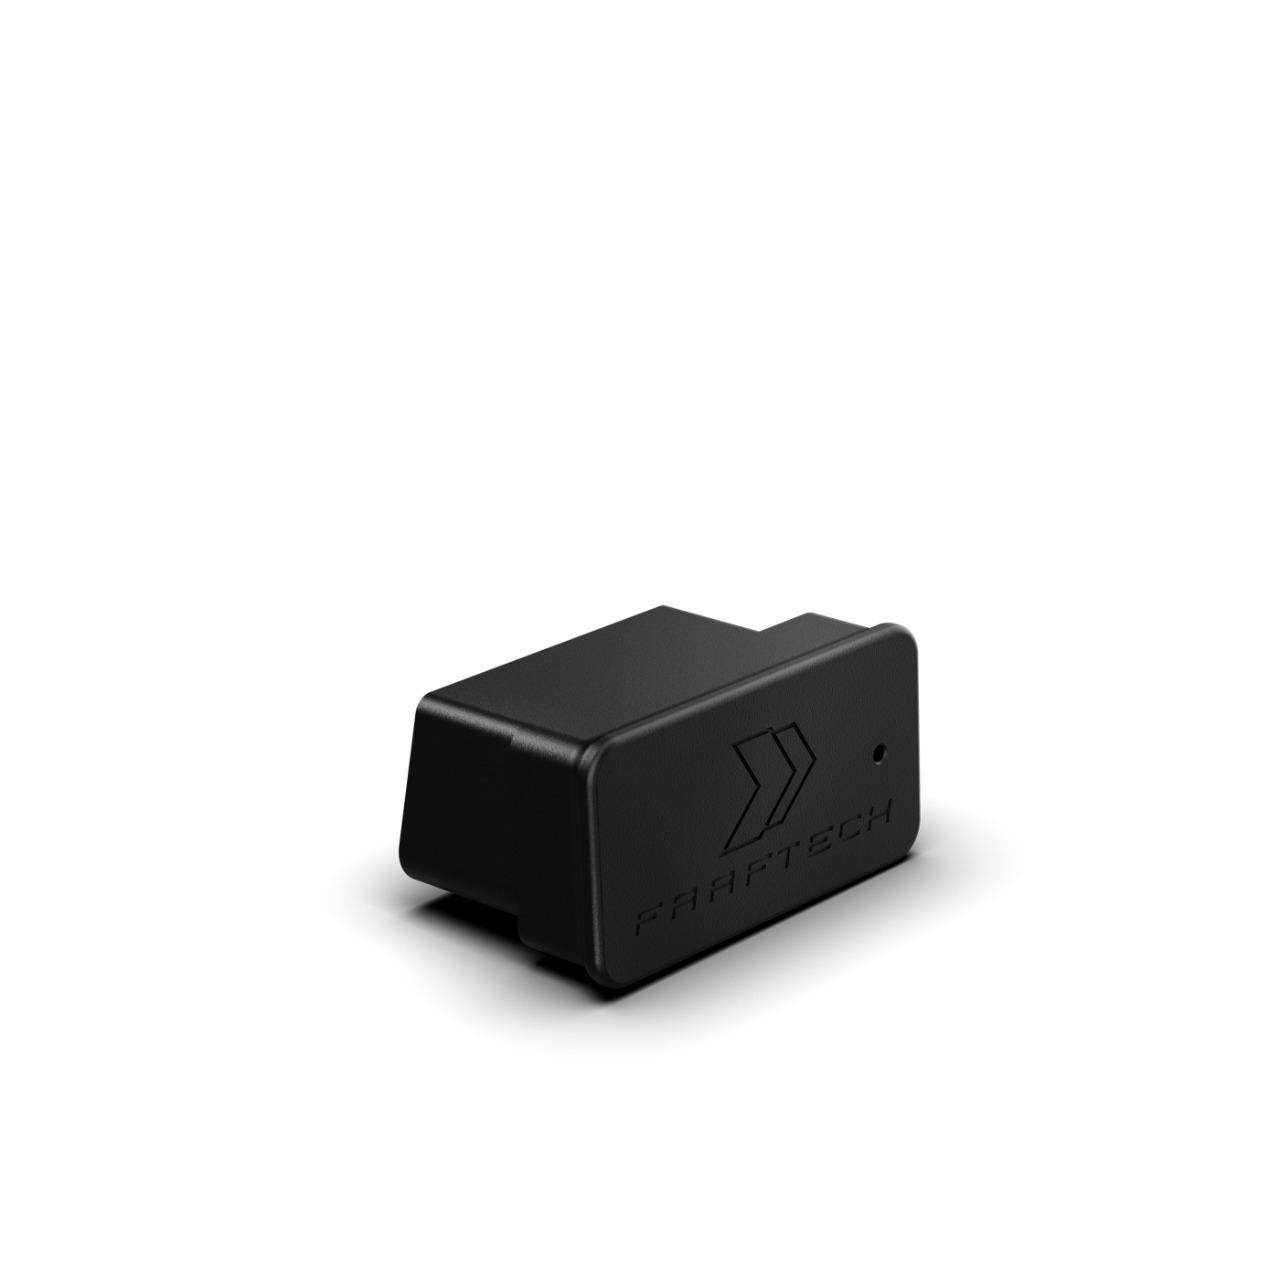 Desbloqueio da USB Nivus T-Cross Virtus Taos Faaftech FT-VF-VW7